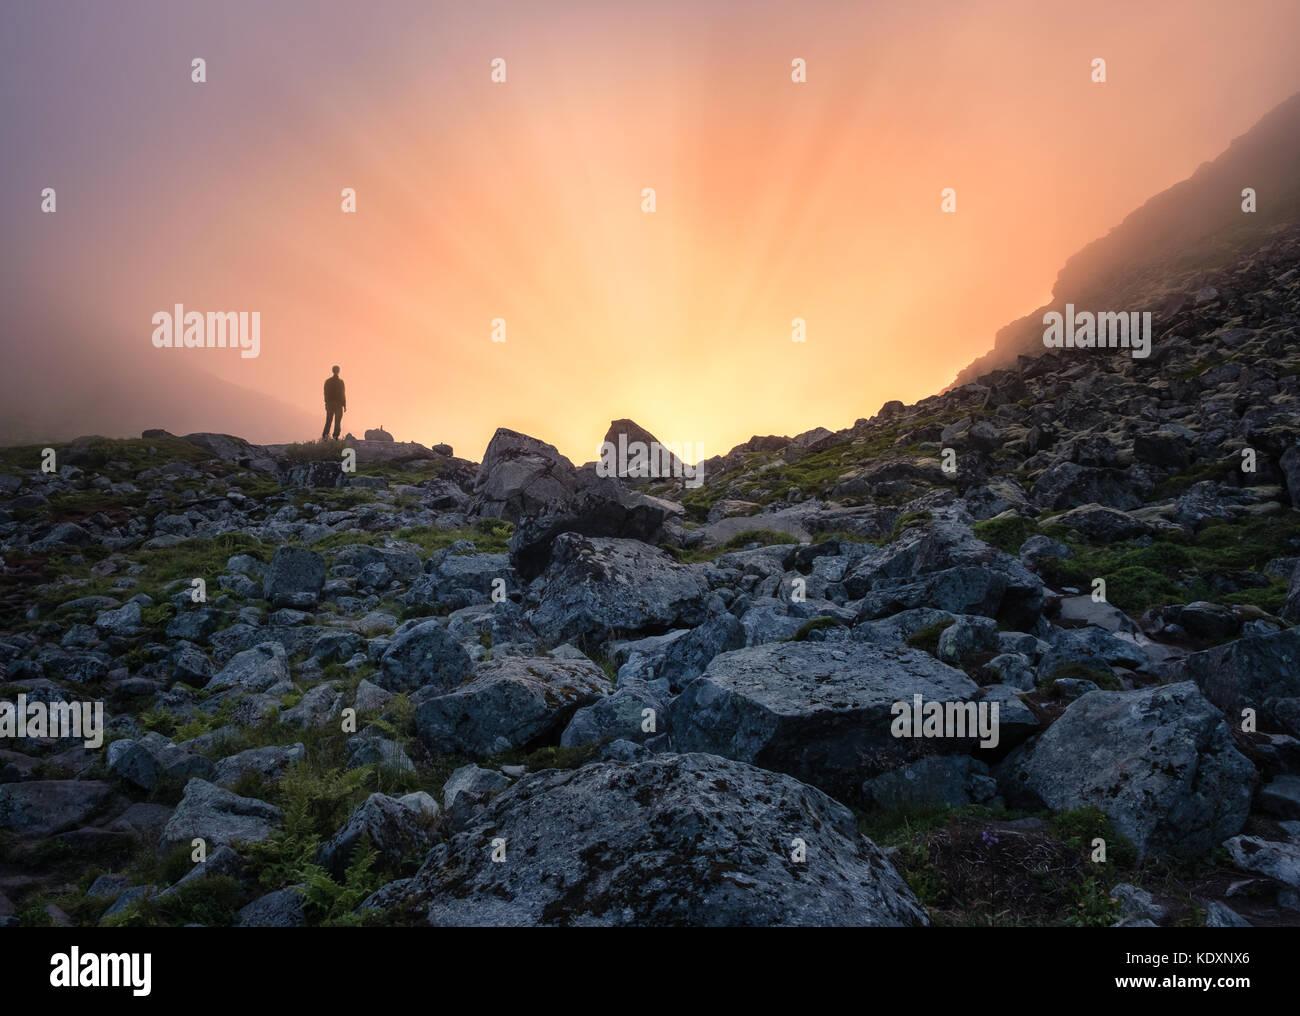 Man standing front of sunlight at summer evening in mountain Lofoten Island - Stock Image